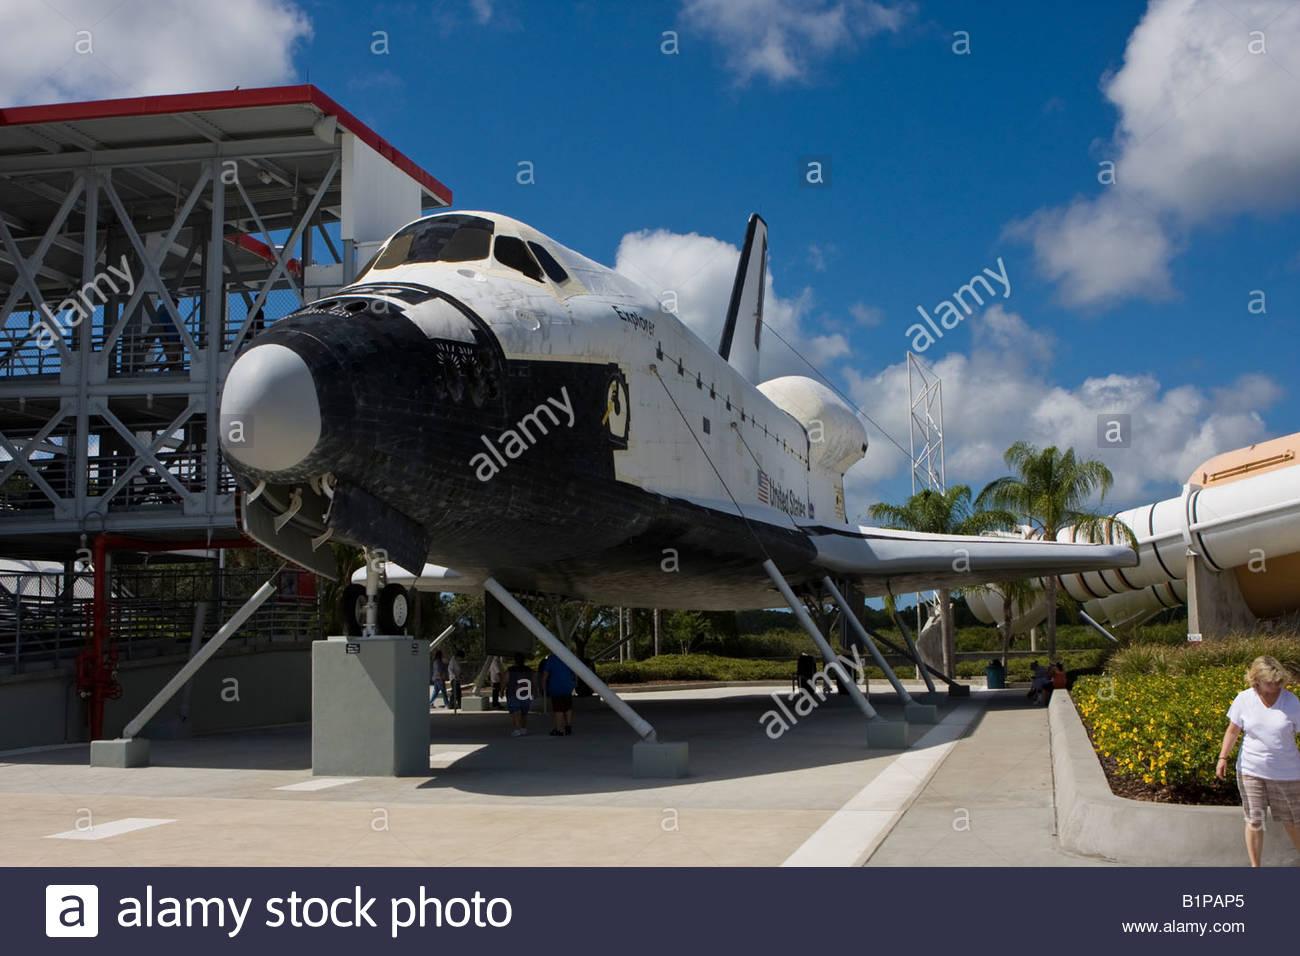 Spaceplane Stock Photos & Spaceplane Stock Images.